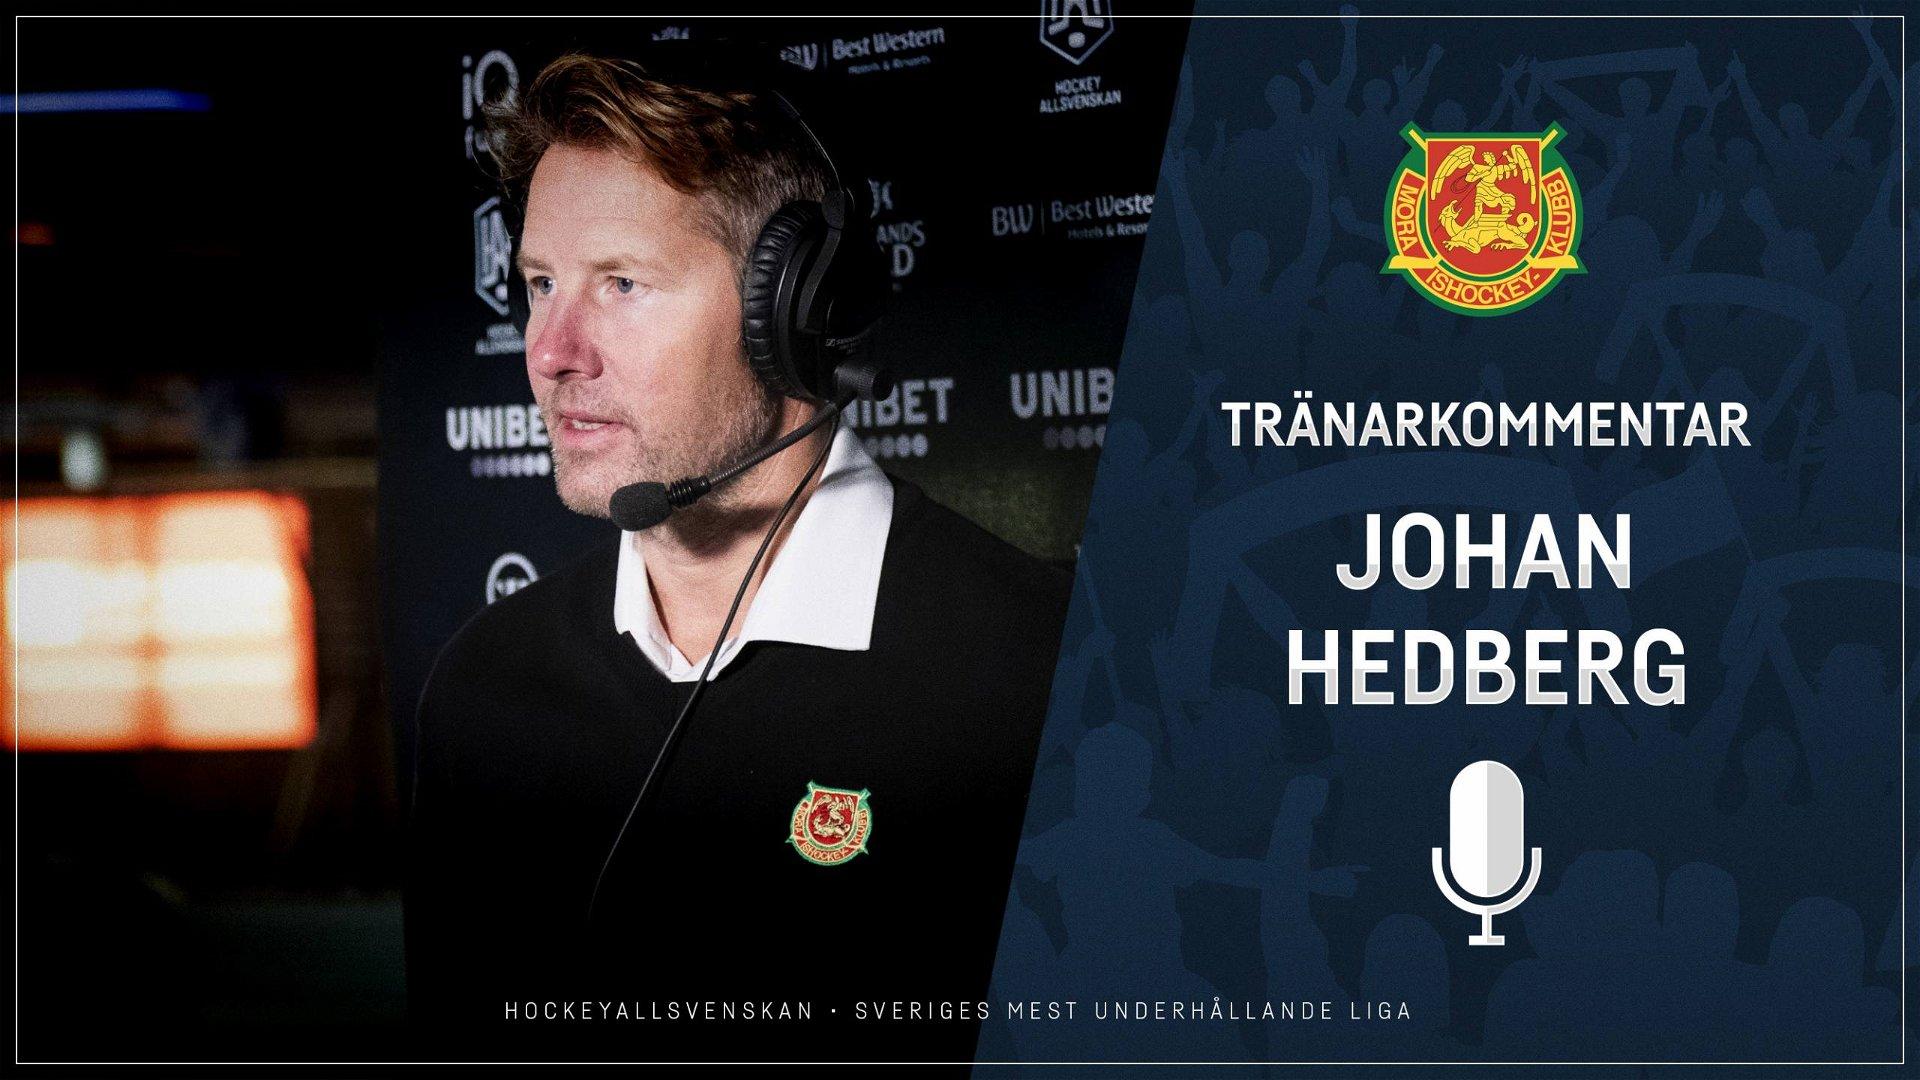 2020-10-20 Segerintervju: Johan Hedberg